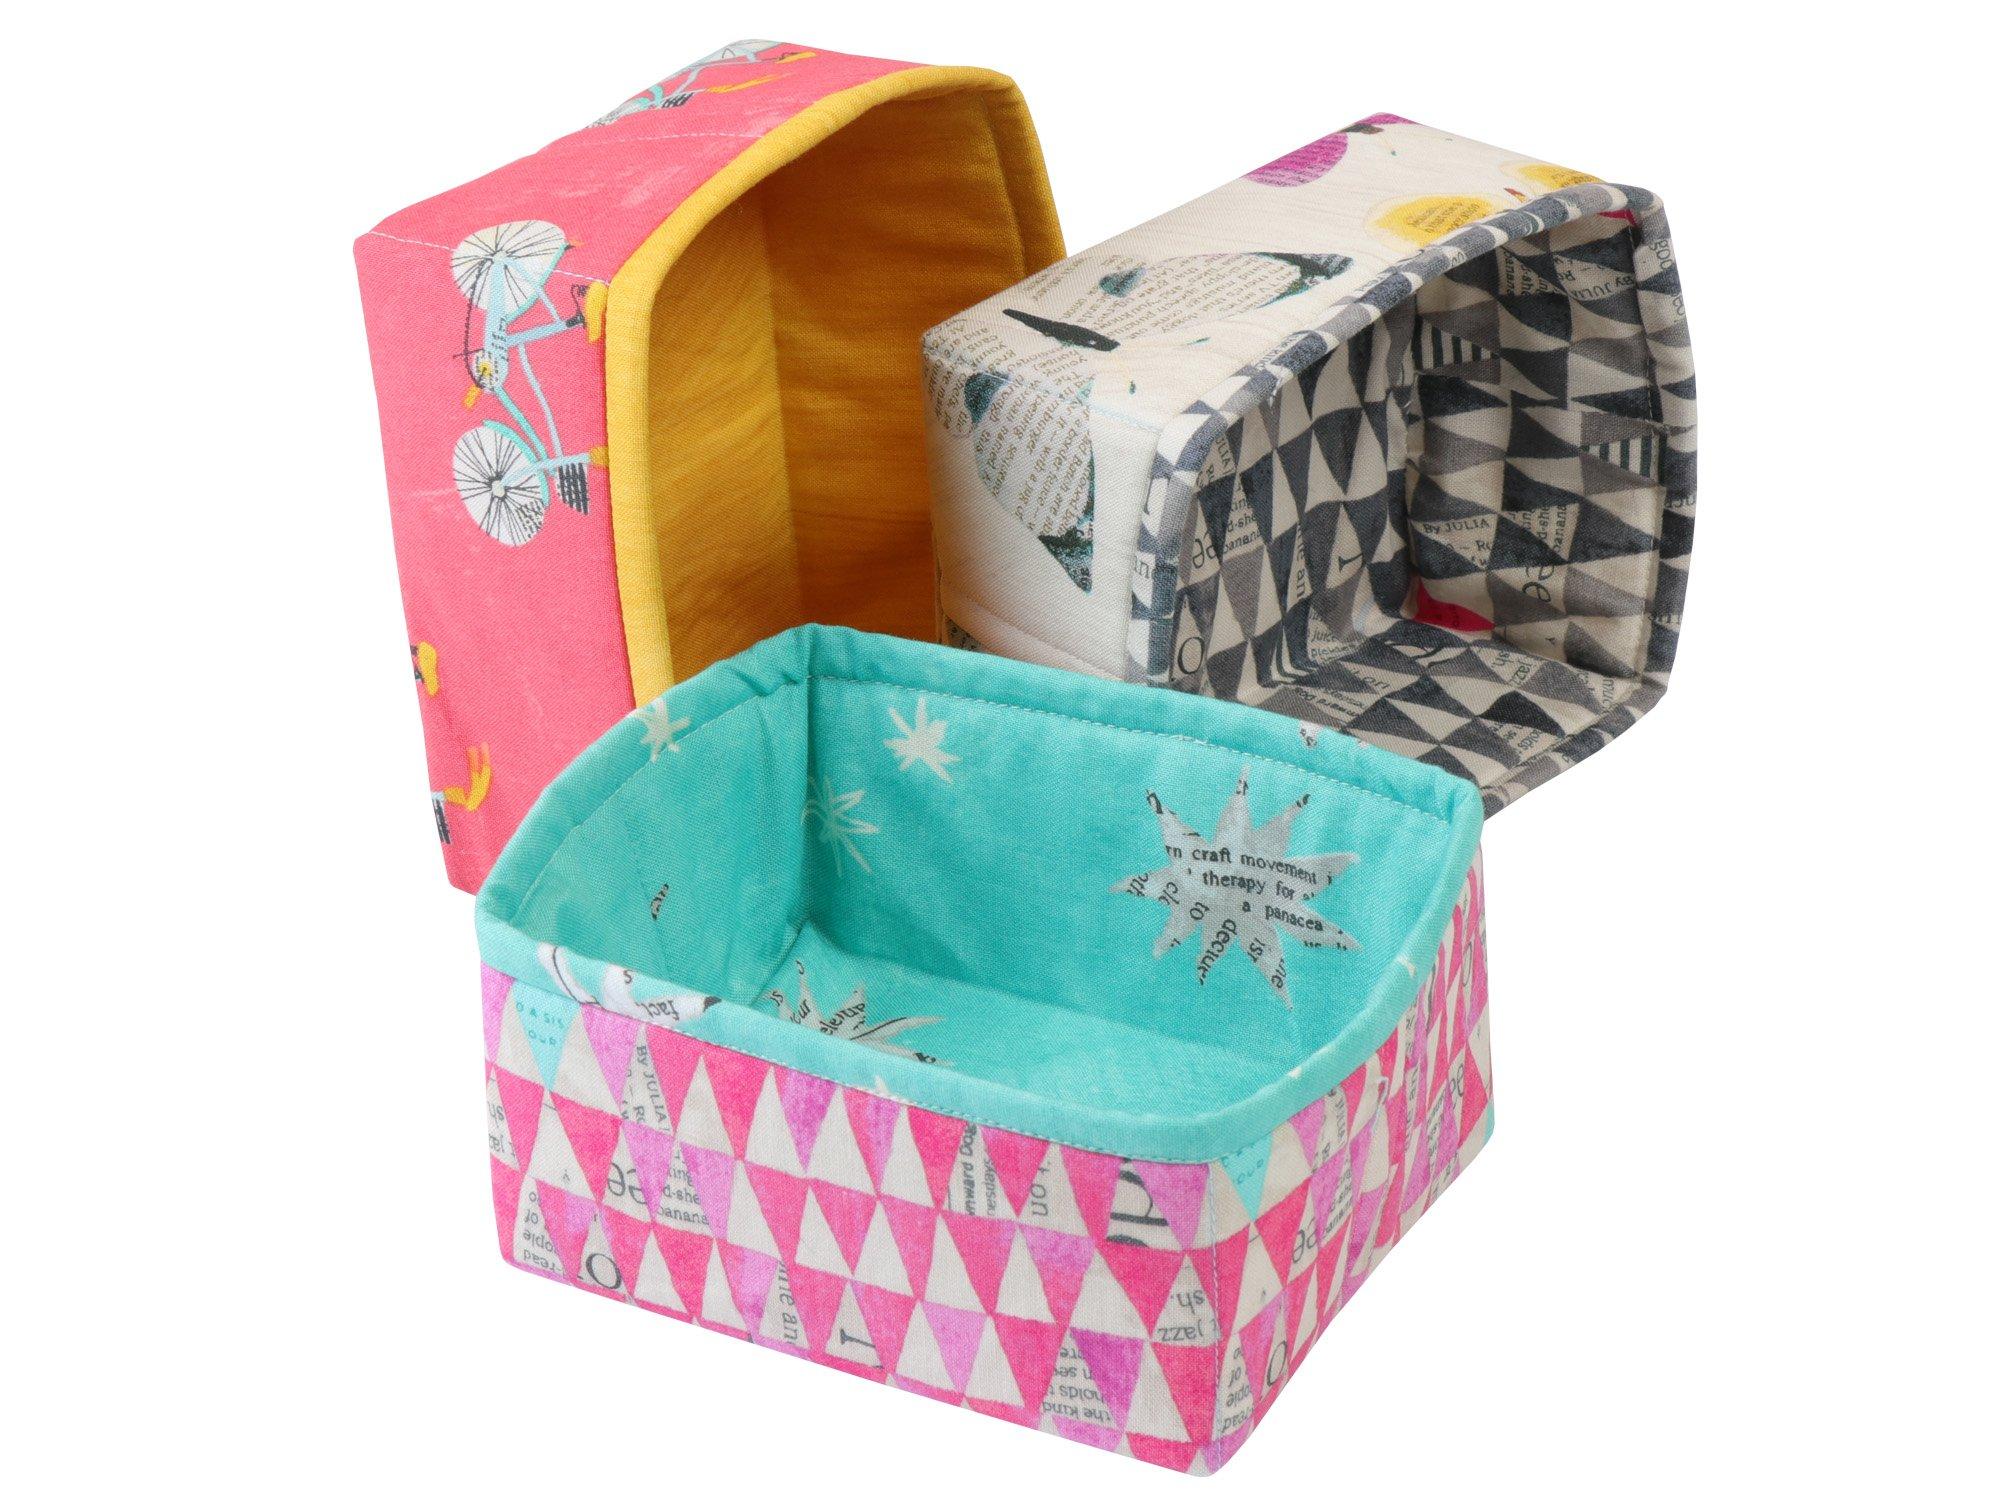 Petit Four Basket: Project Kit